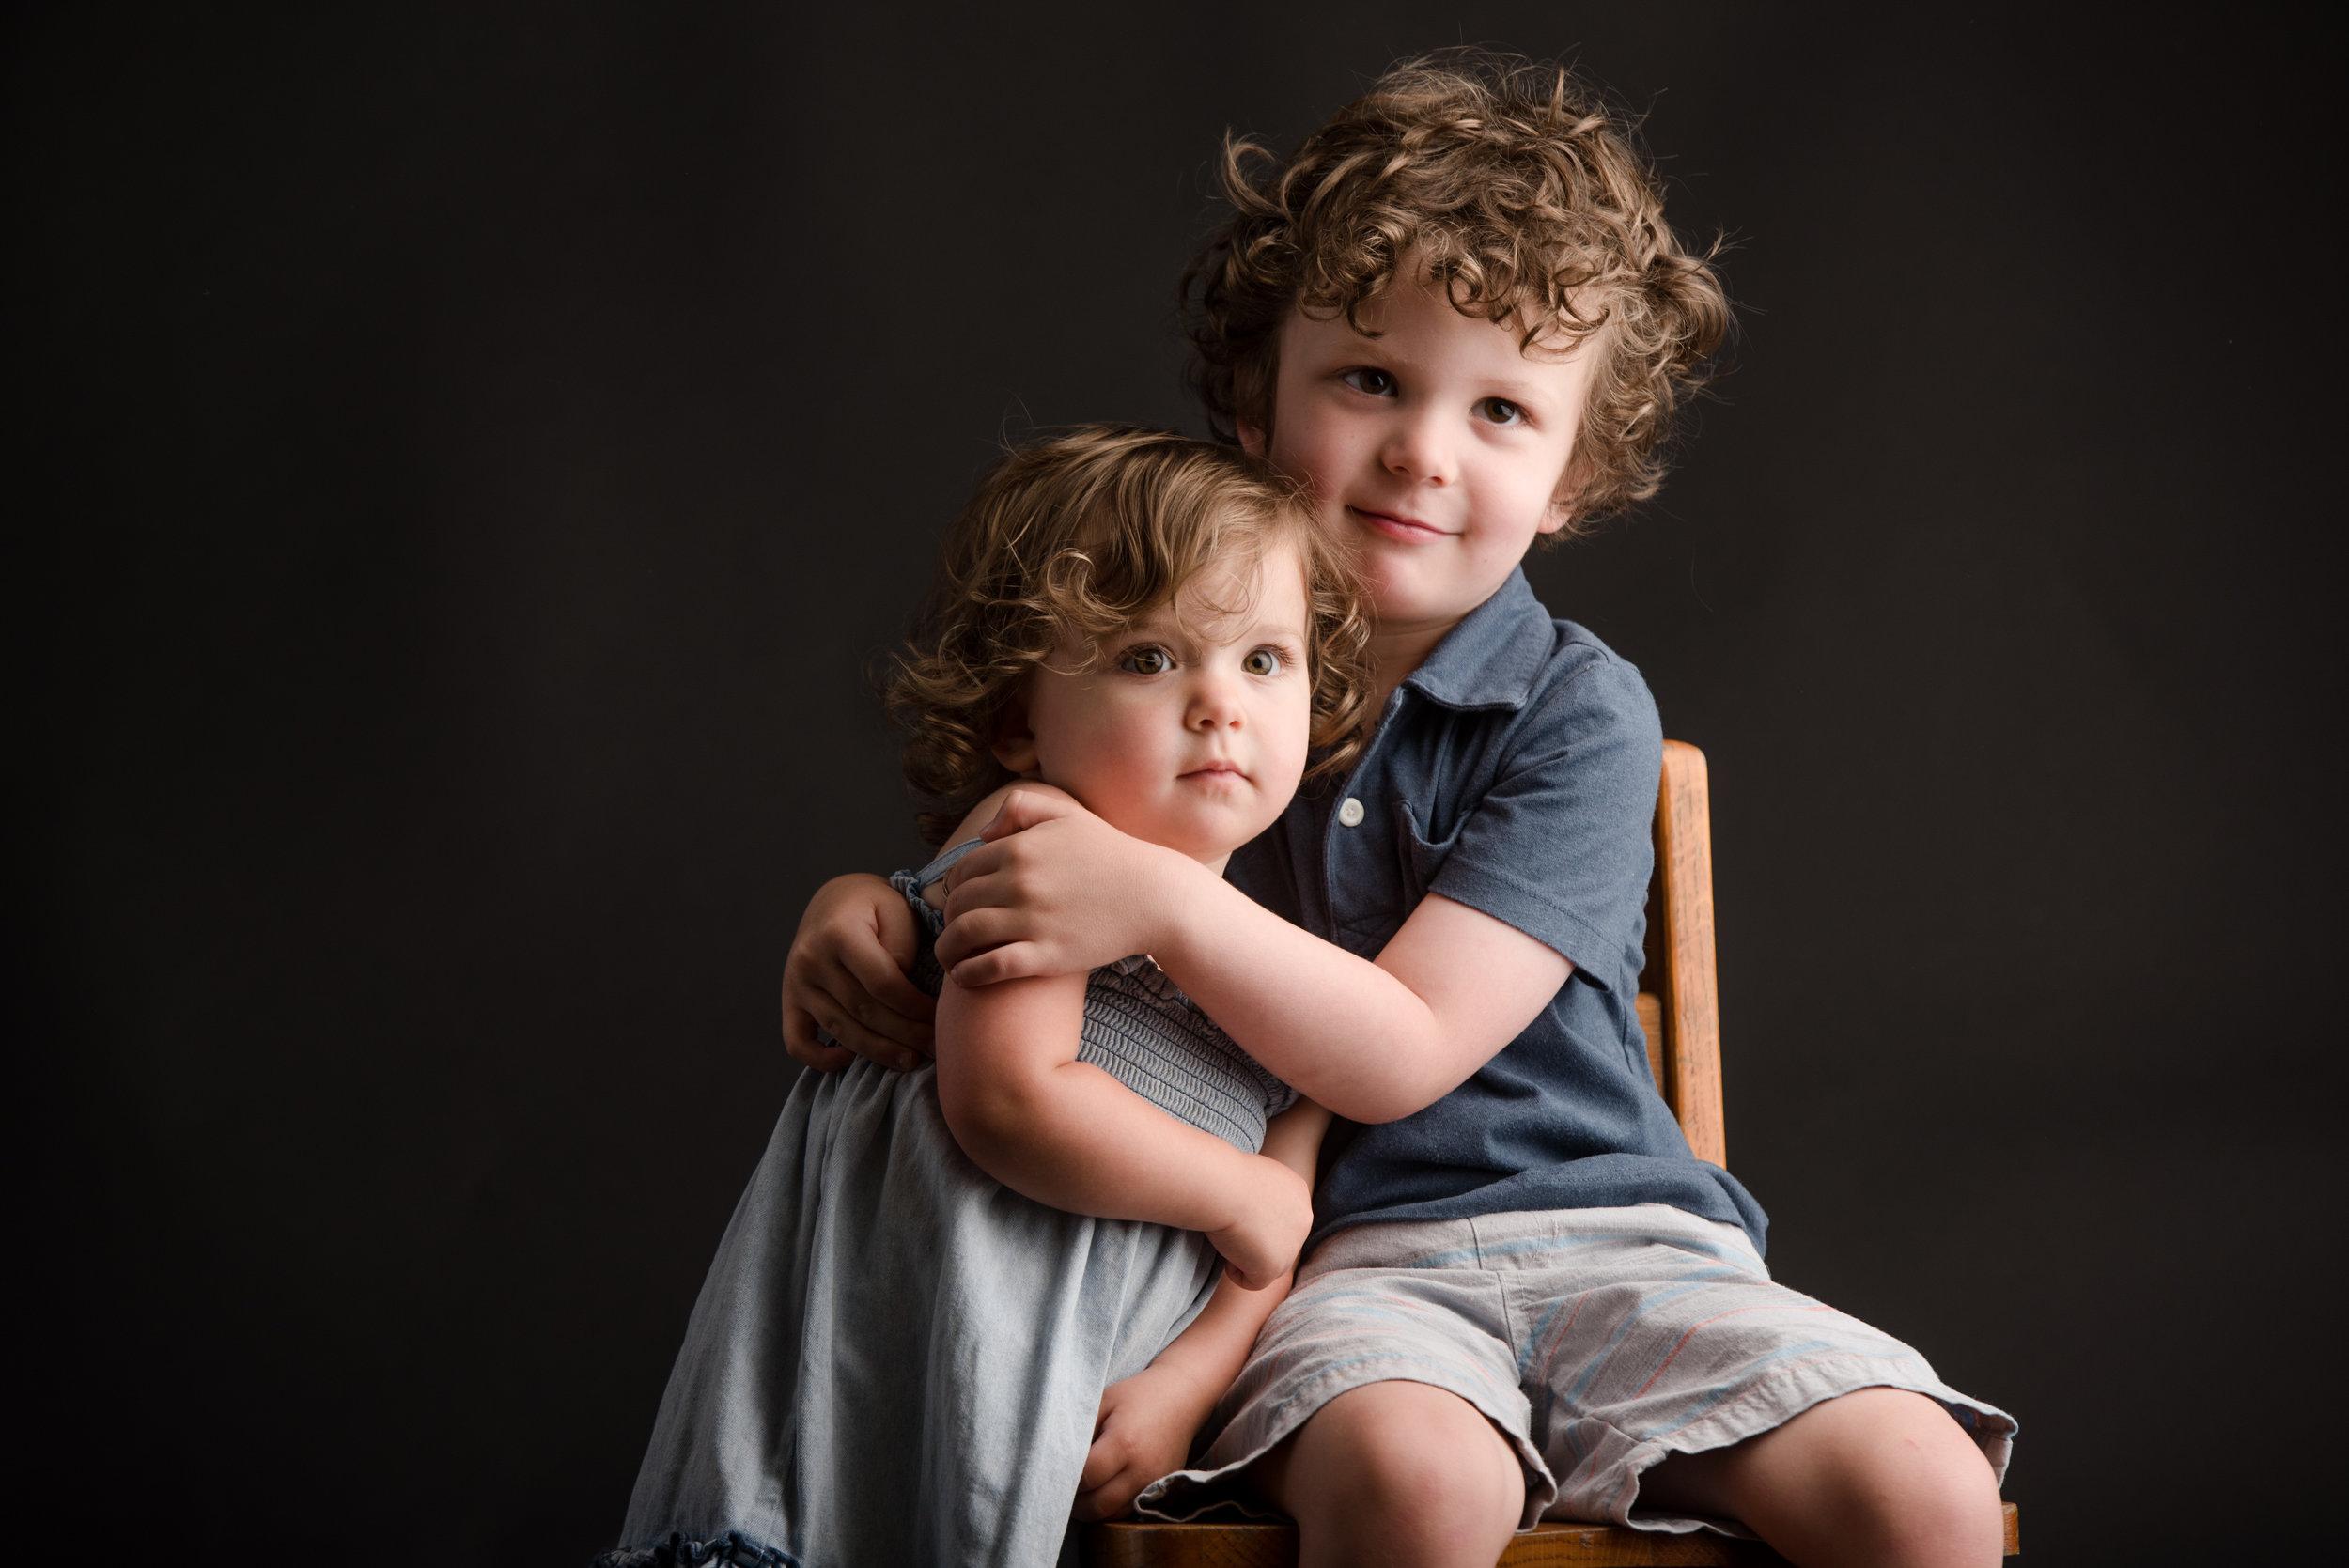 Raleigh Durham Chapel Hill Studio Portrait Photographer